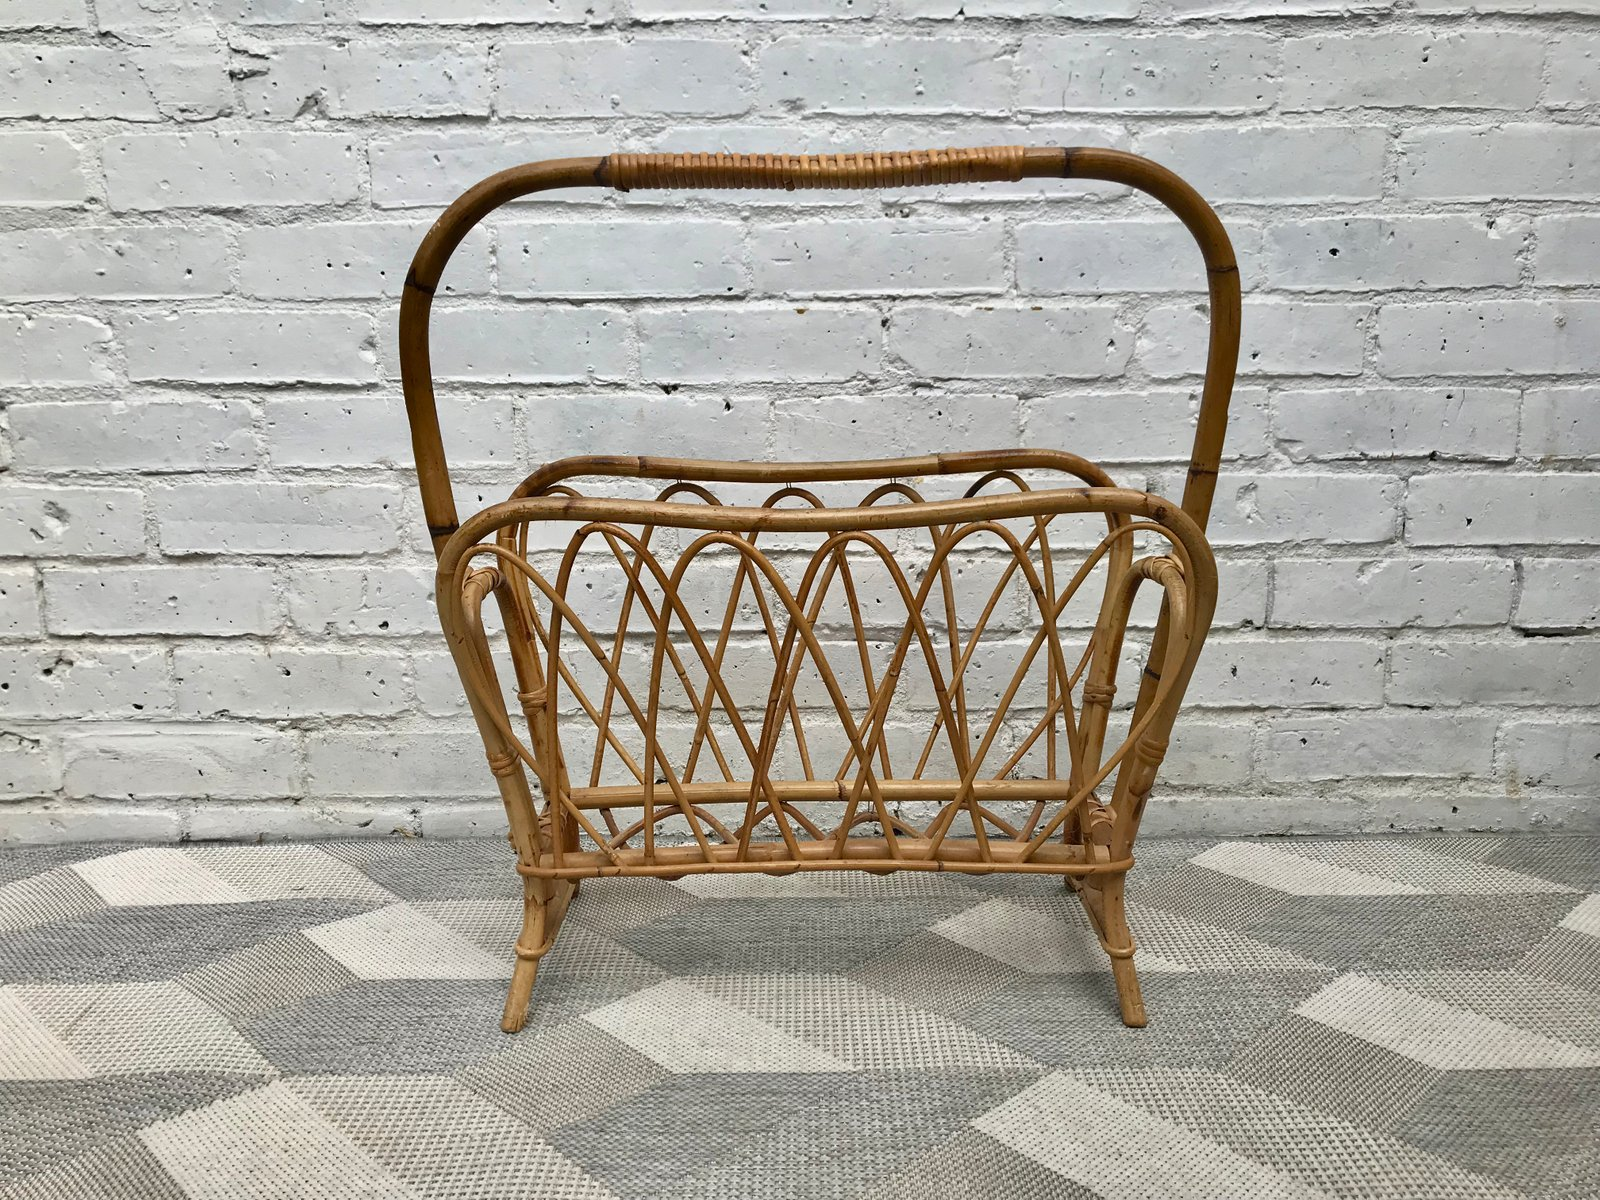 porte revue en osier 1960s en vente sur pamono. Black Bedroom Furniture Sets. Home Design Ideas